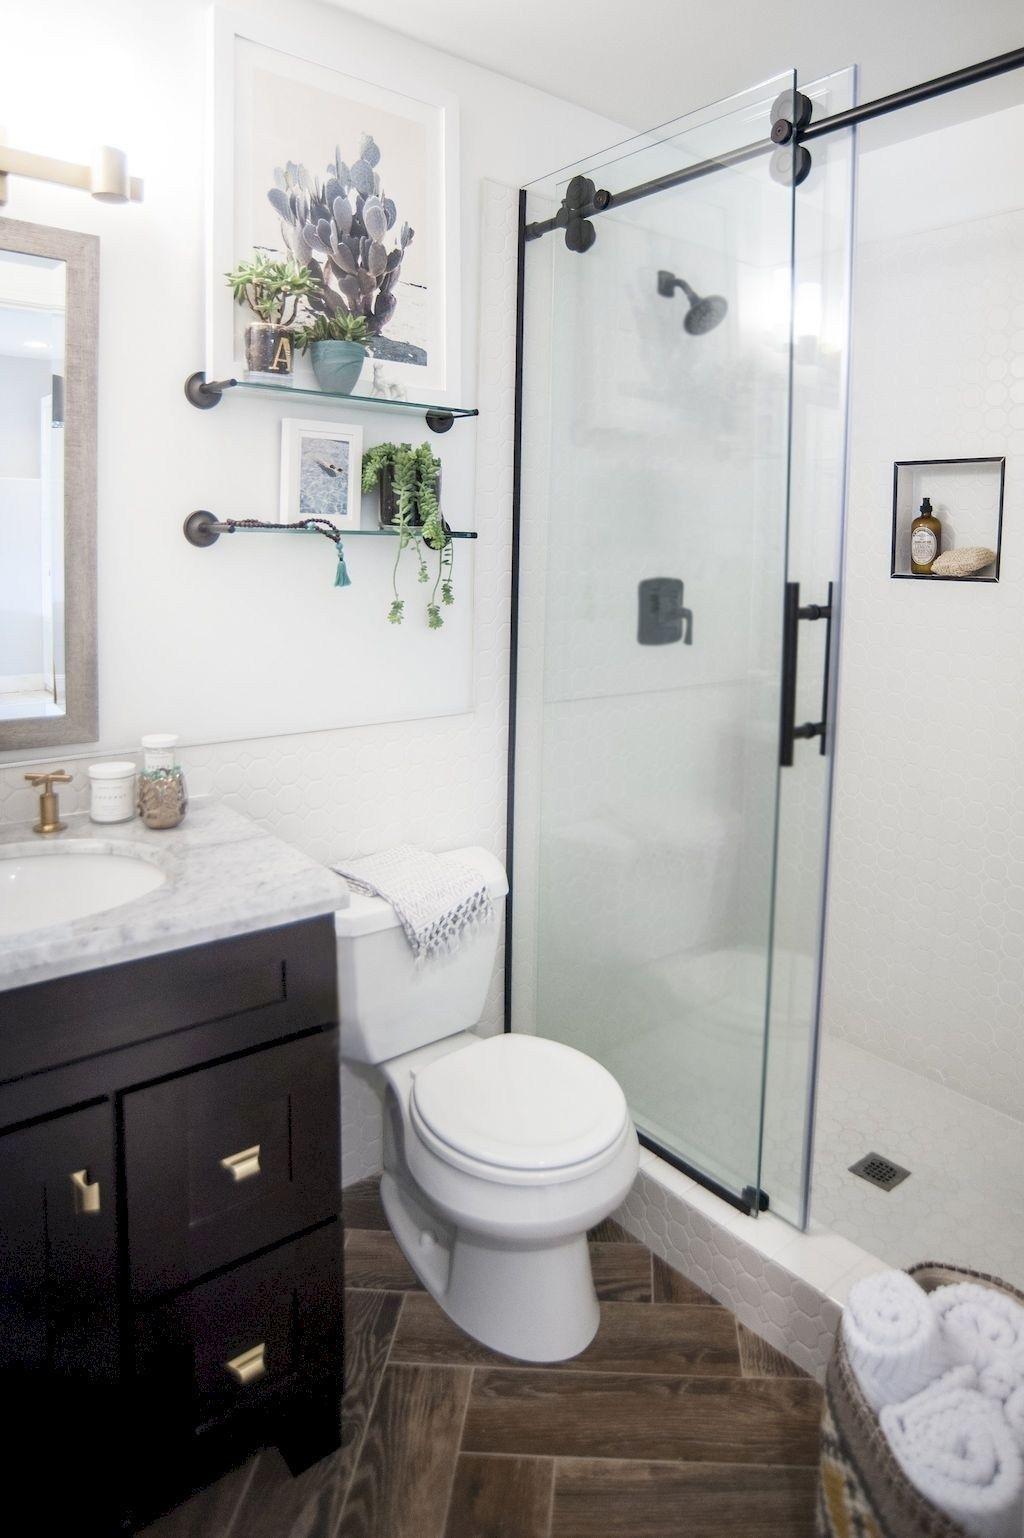 stunning farmhouse small bathroom design ideas 39 small on stunning small bathroom design ideas id=24409